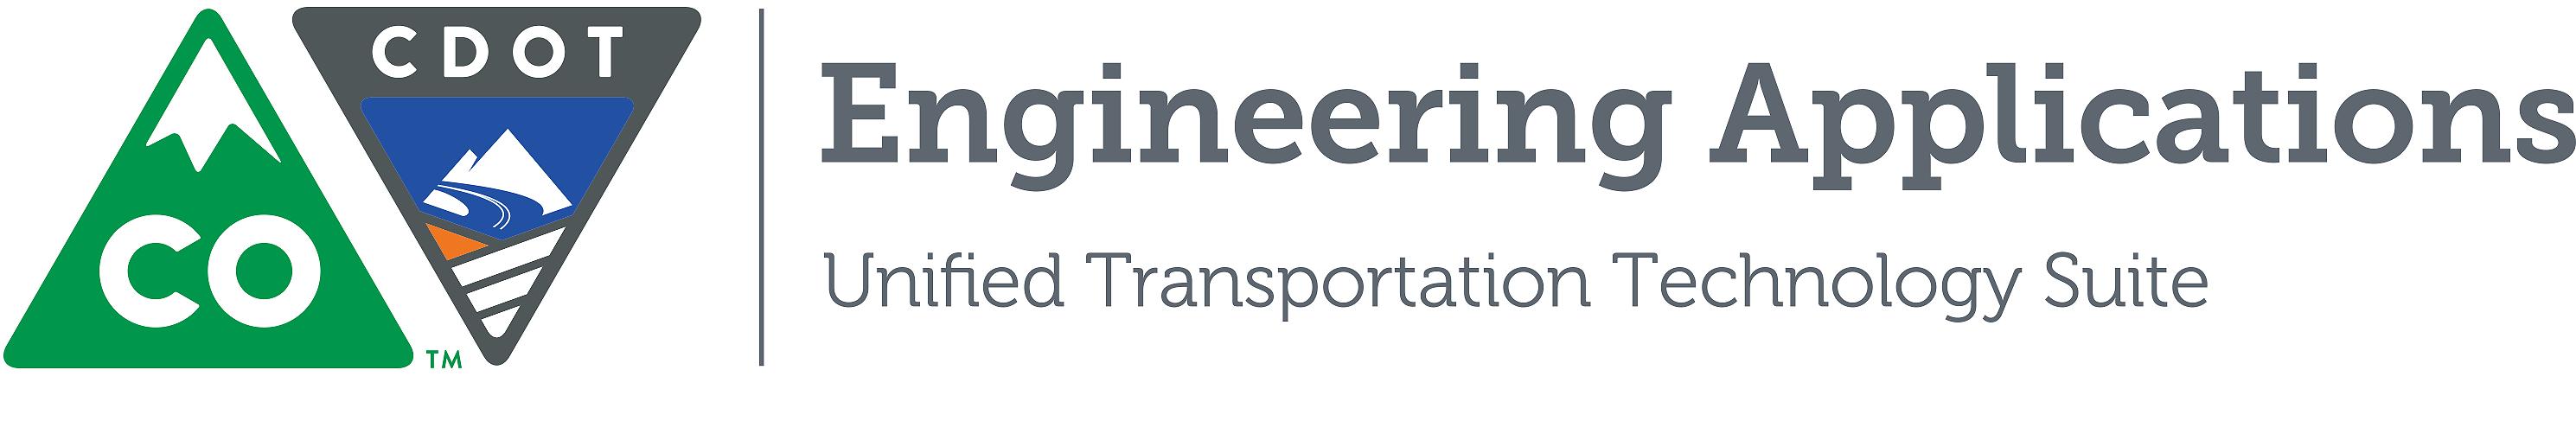 Engineering Applications Logo detail image